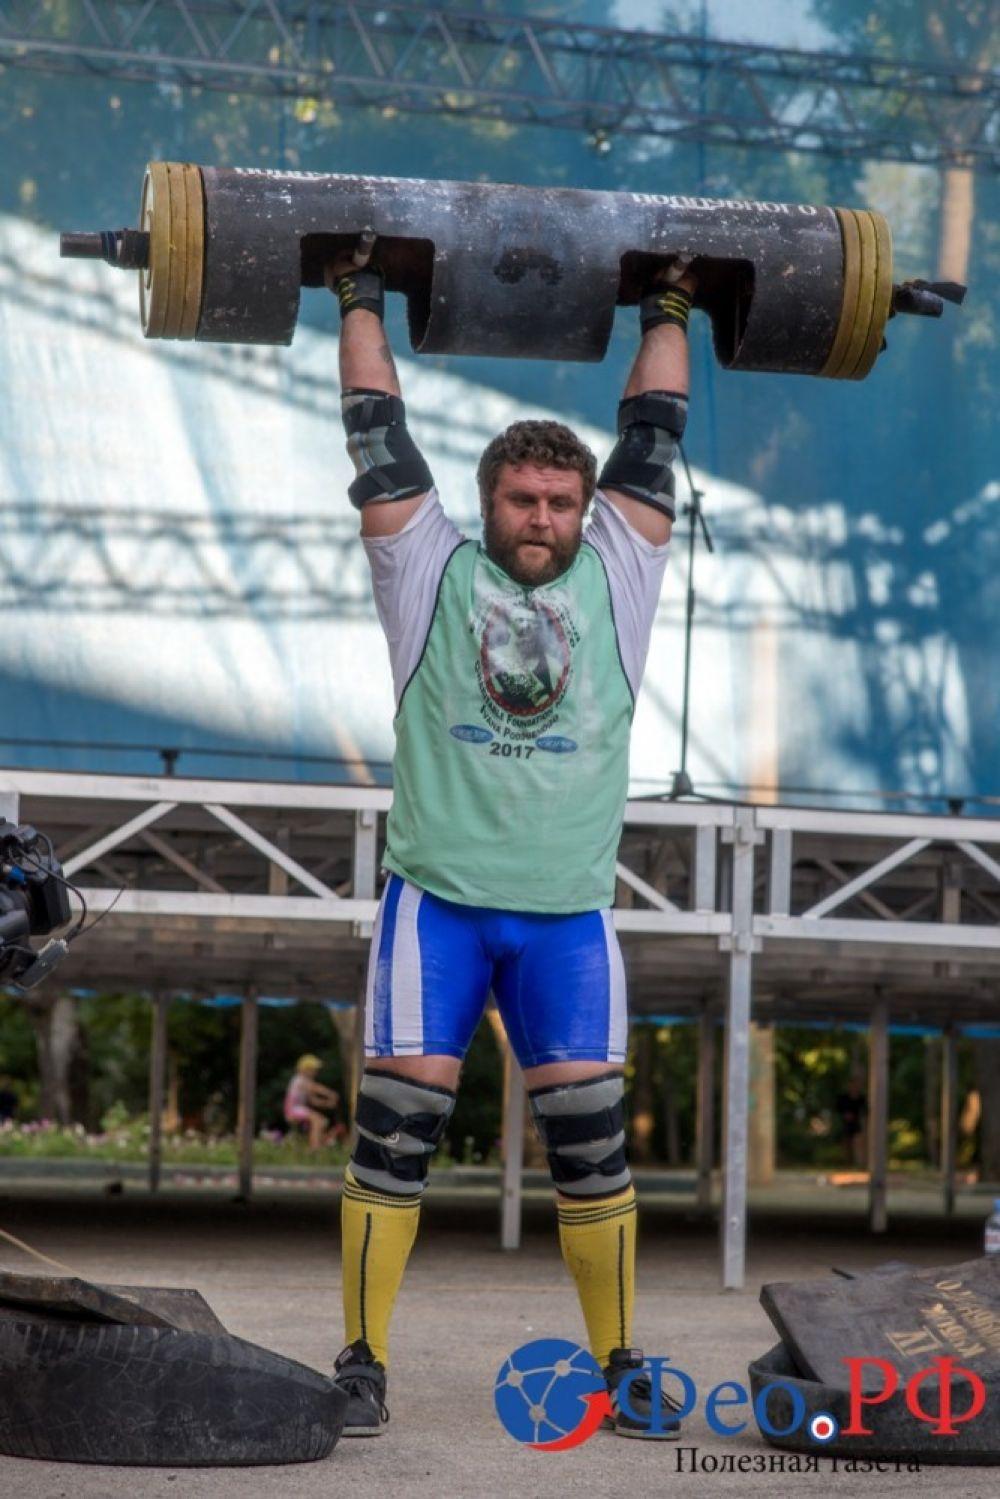 Феодосийский силовой экстрим в фоторепортаже Вадима Стрельцова